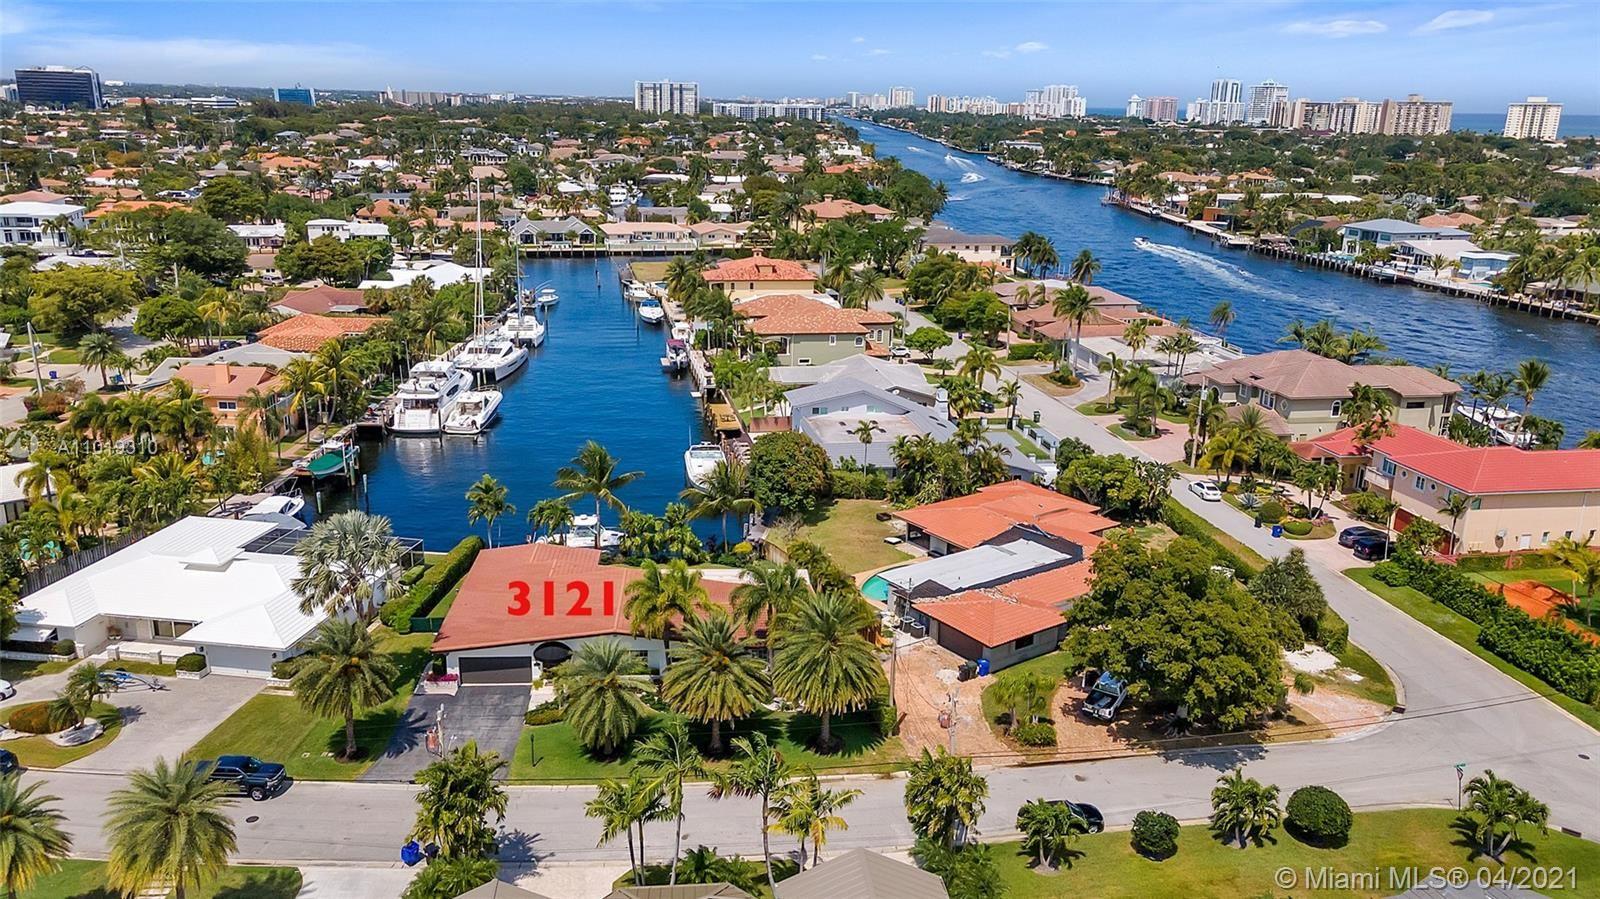 3121 NE 55th Ct, Fort Lauderdale, FL 33308 - #: A11019310